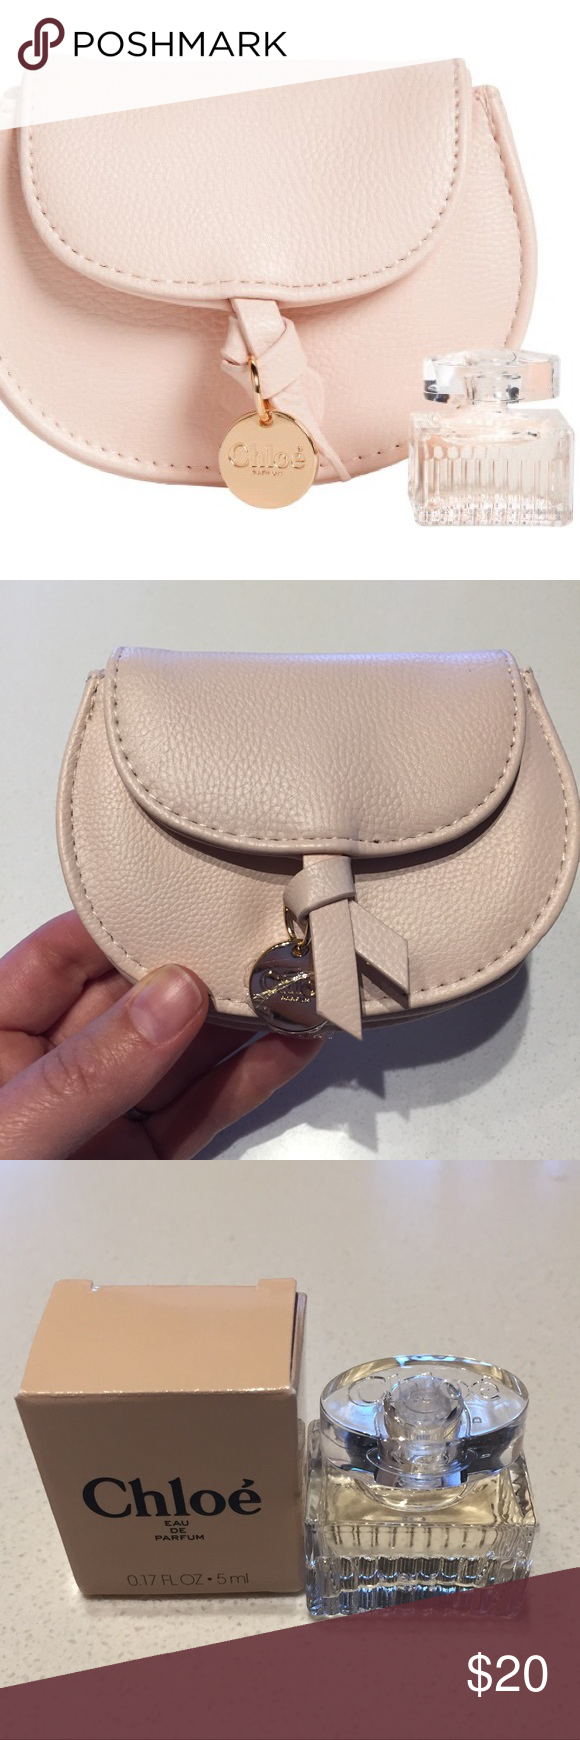 Chloe mini cosmetic pouch and Perfume Sample b25125af611f1